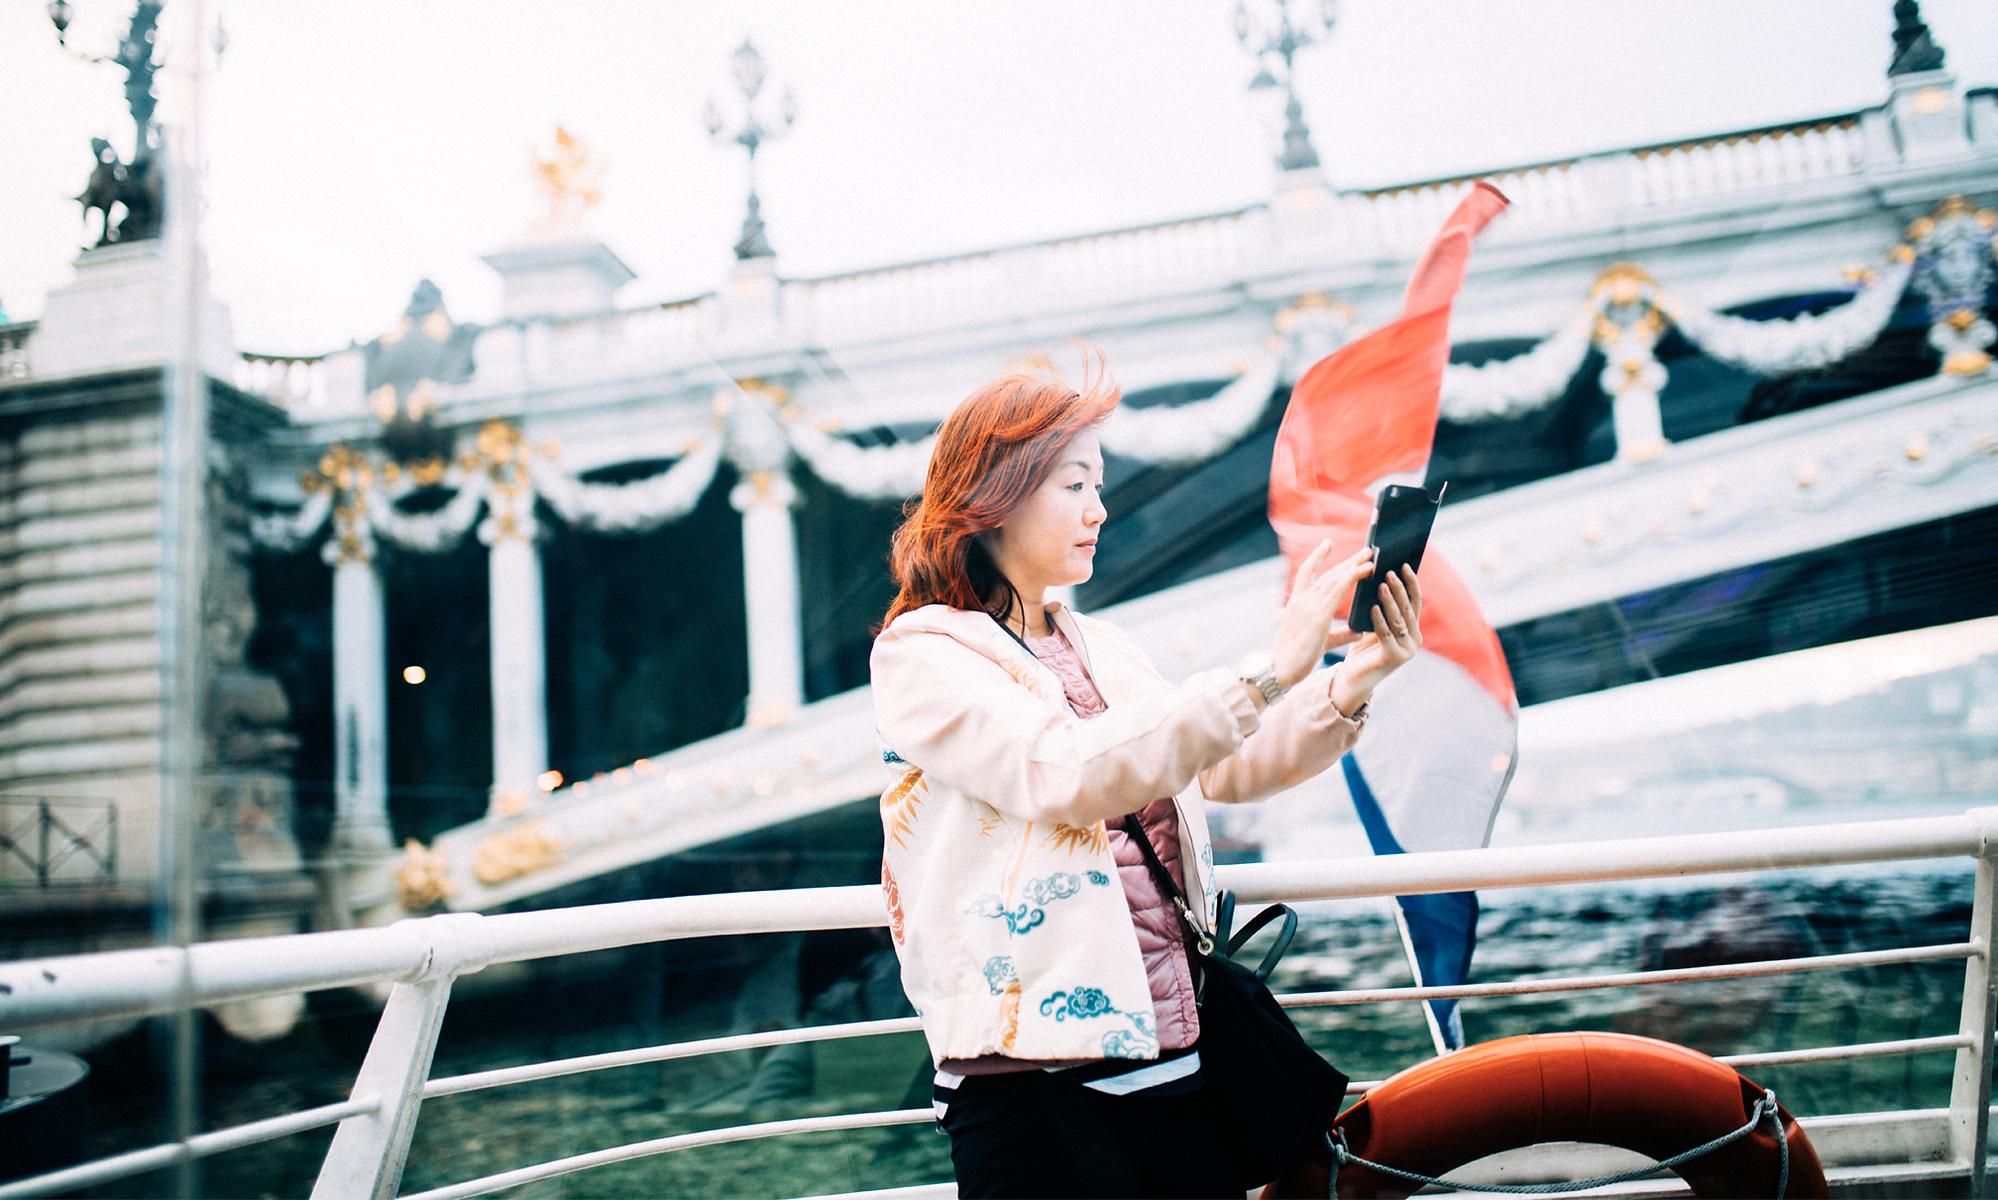 Paris girl holding phone